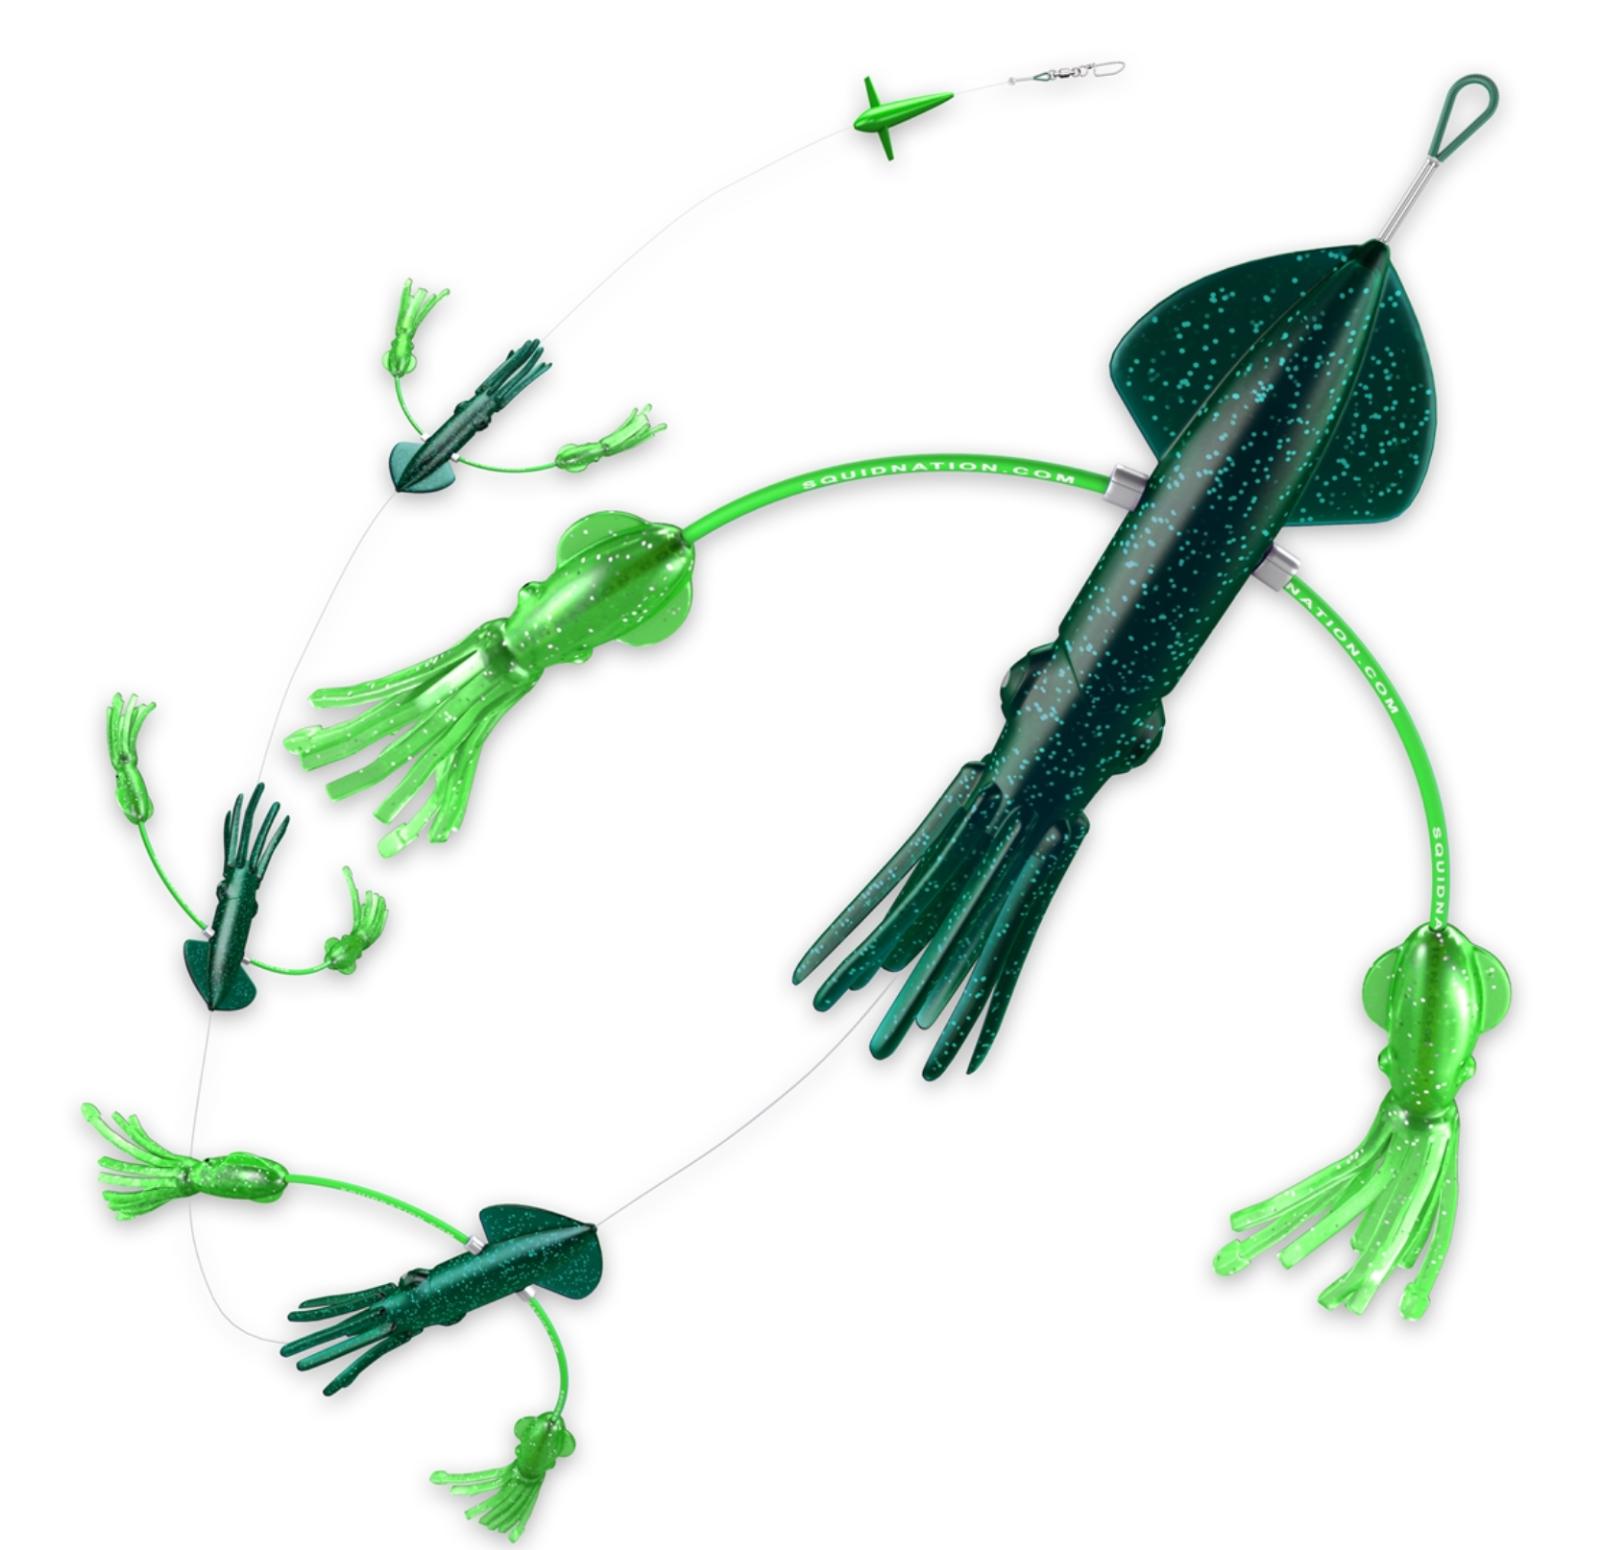 Squidnation Original Original Original Flippy Floppy Thing Tuna Marlin Magnet Daisy Chain Teaser bac083